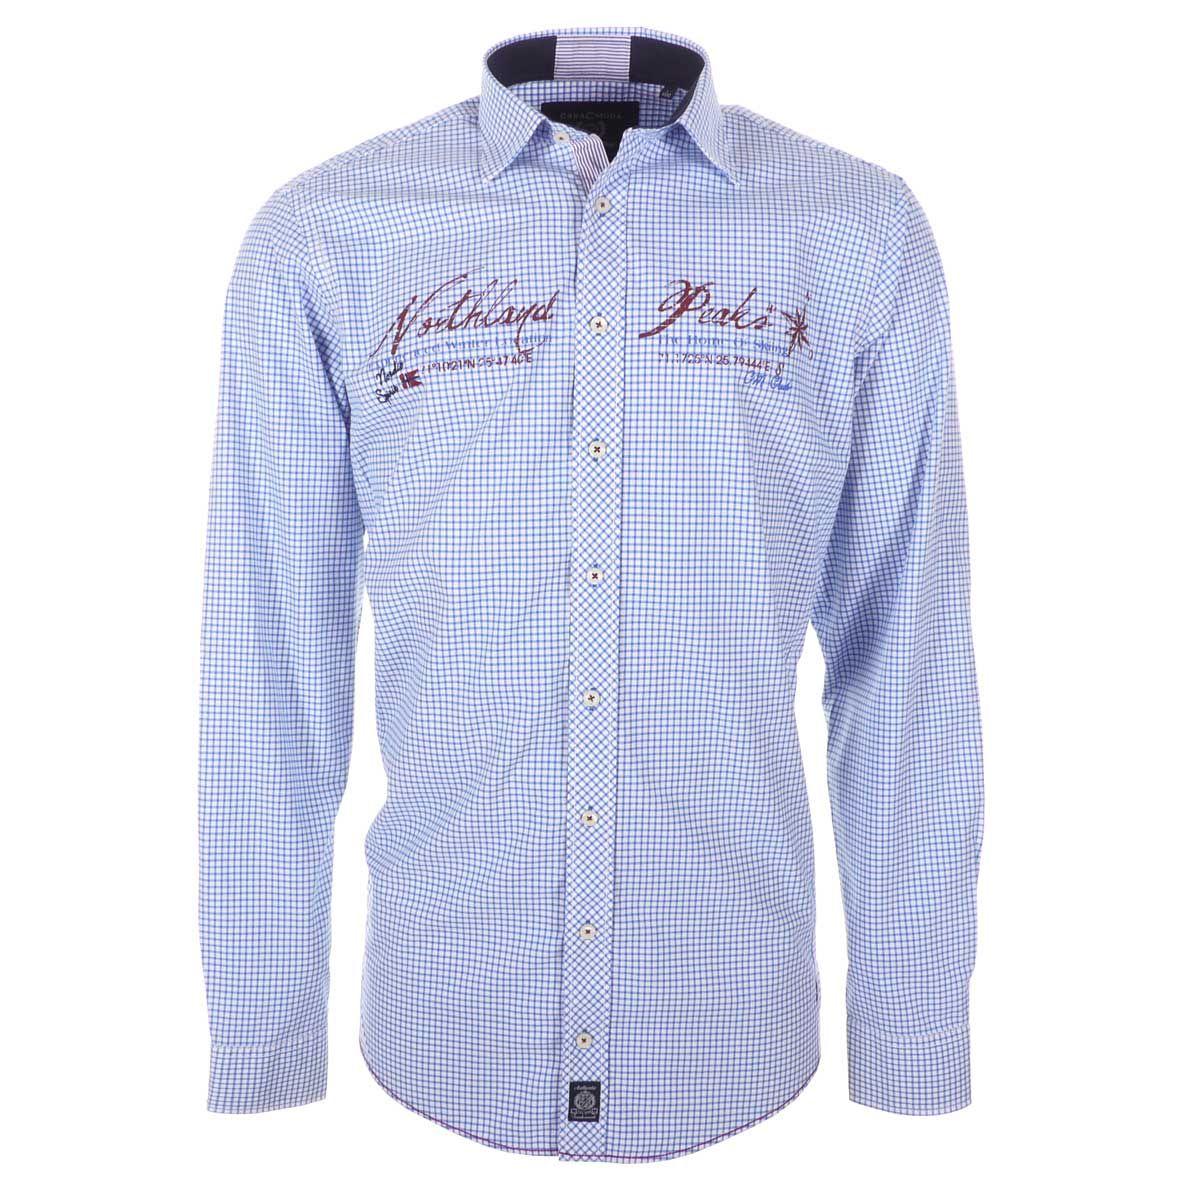 chemise bleue pour homme grand manches extra longues. Black Bedroom Furniture Sets. Home Design Ideas